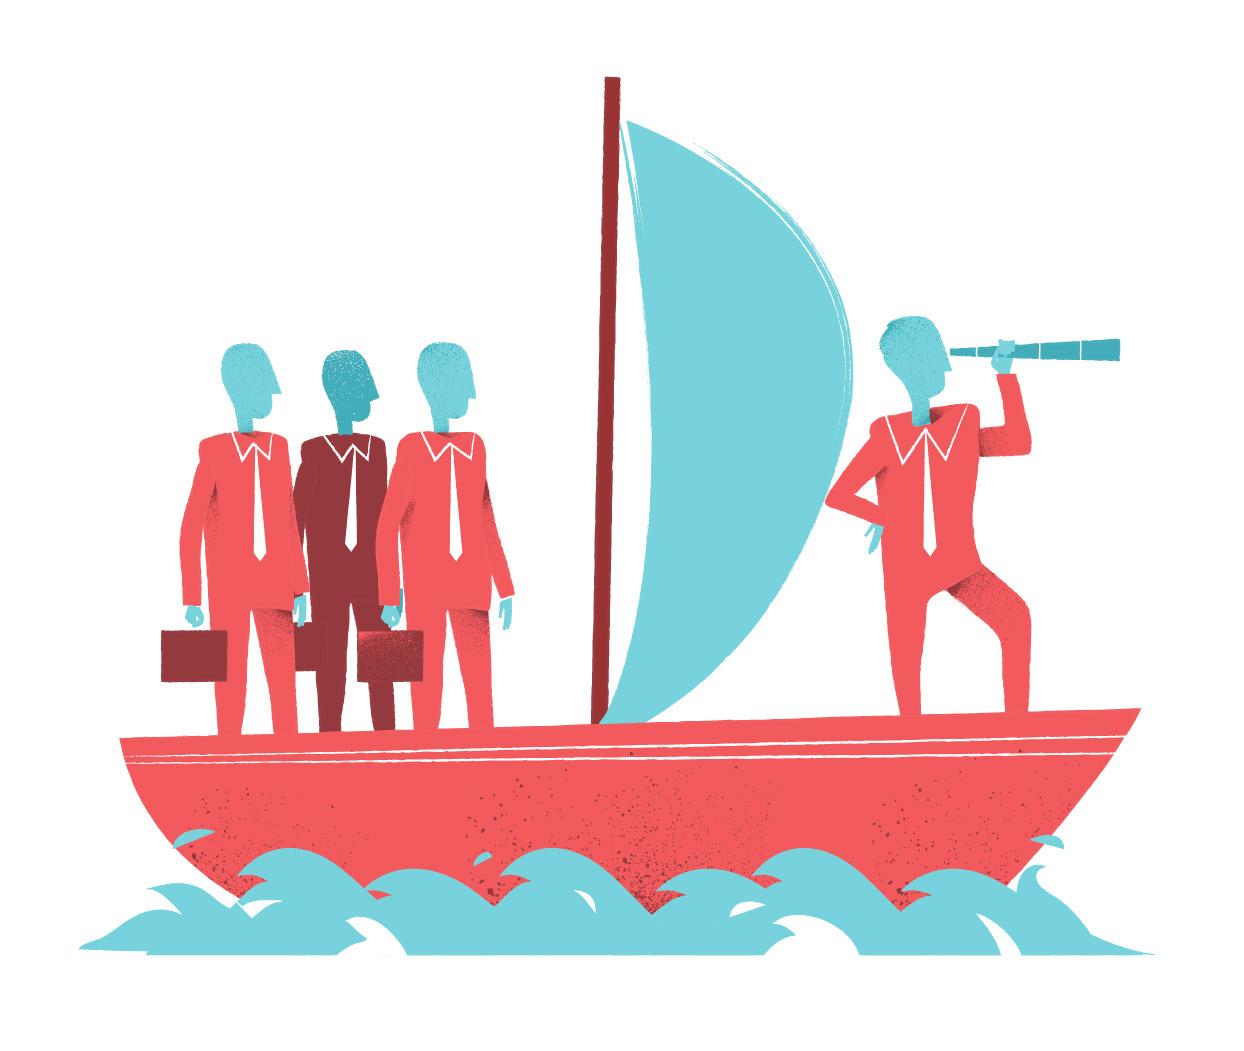 download leader navigator vector art series by Hurca.com